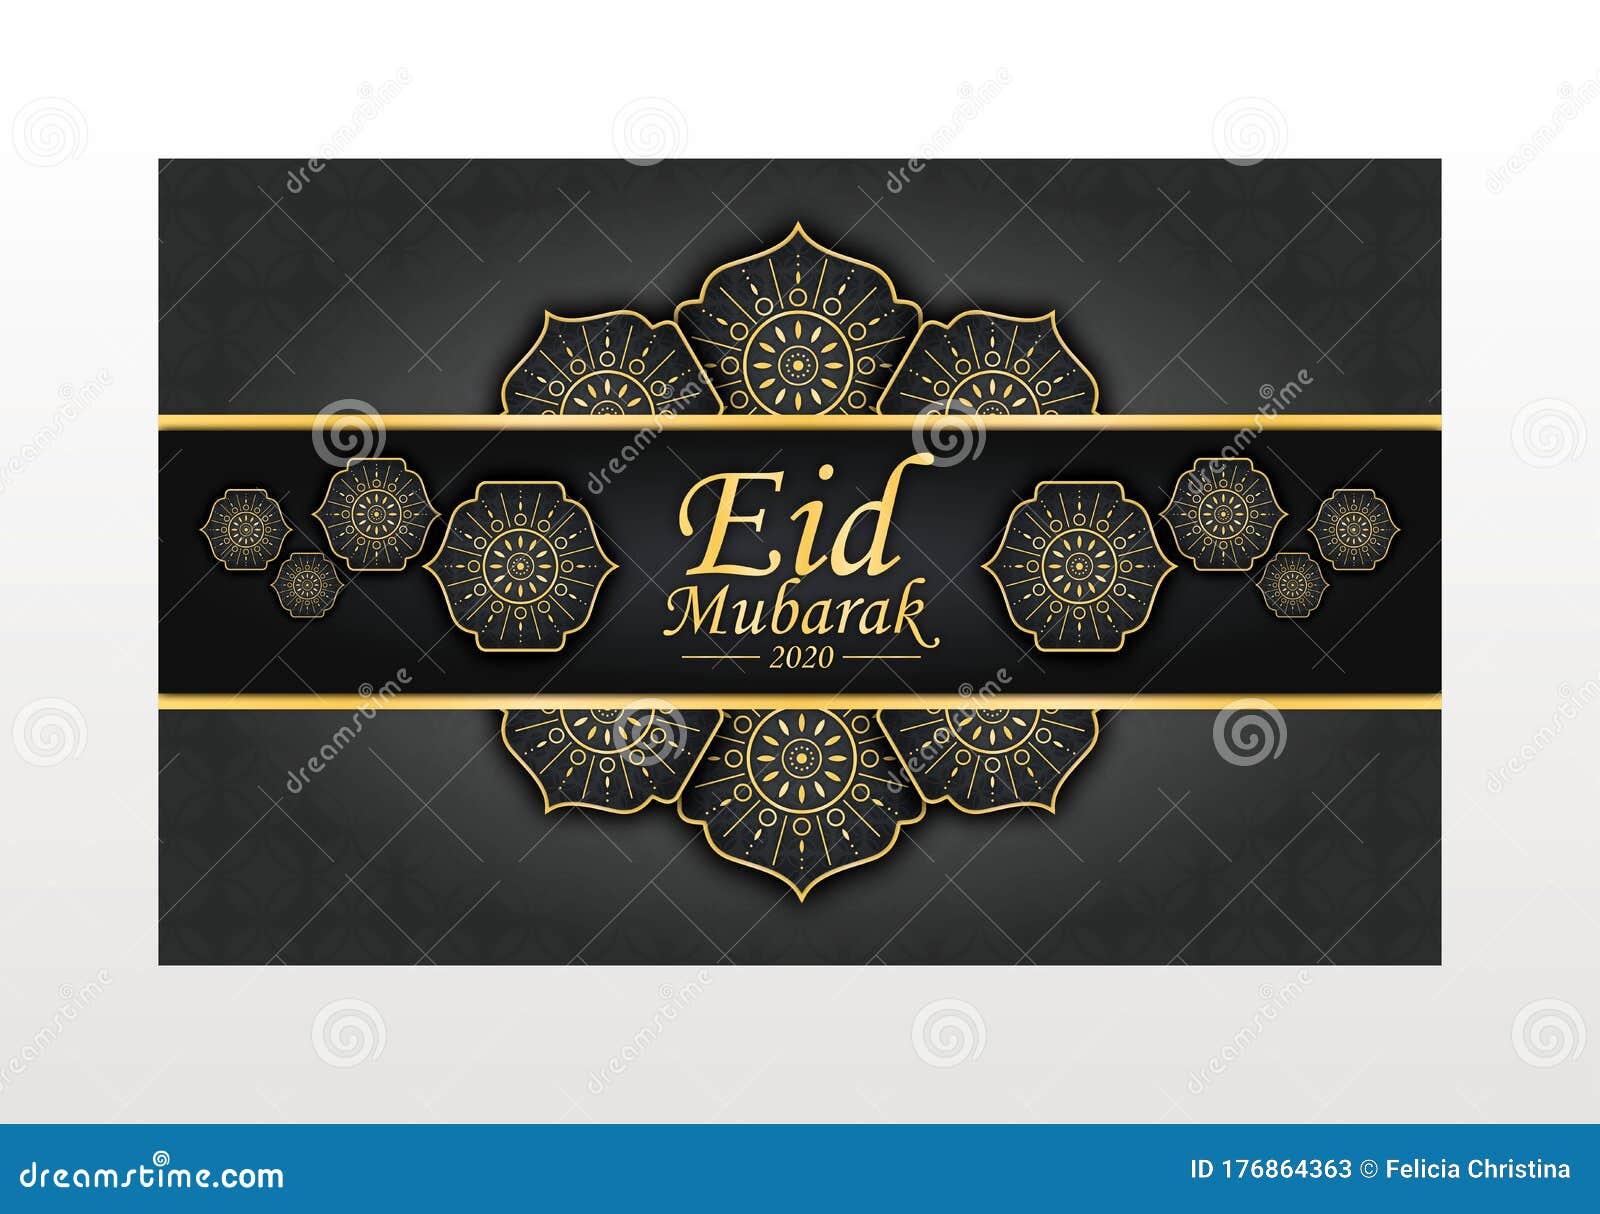 eid mubarak 2020 coloful elegant greeting card stock